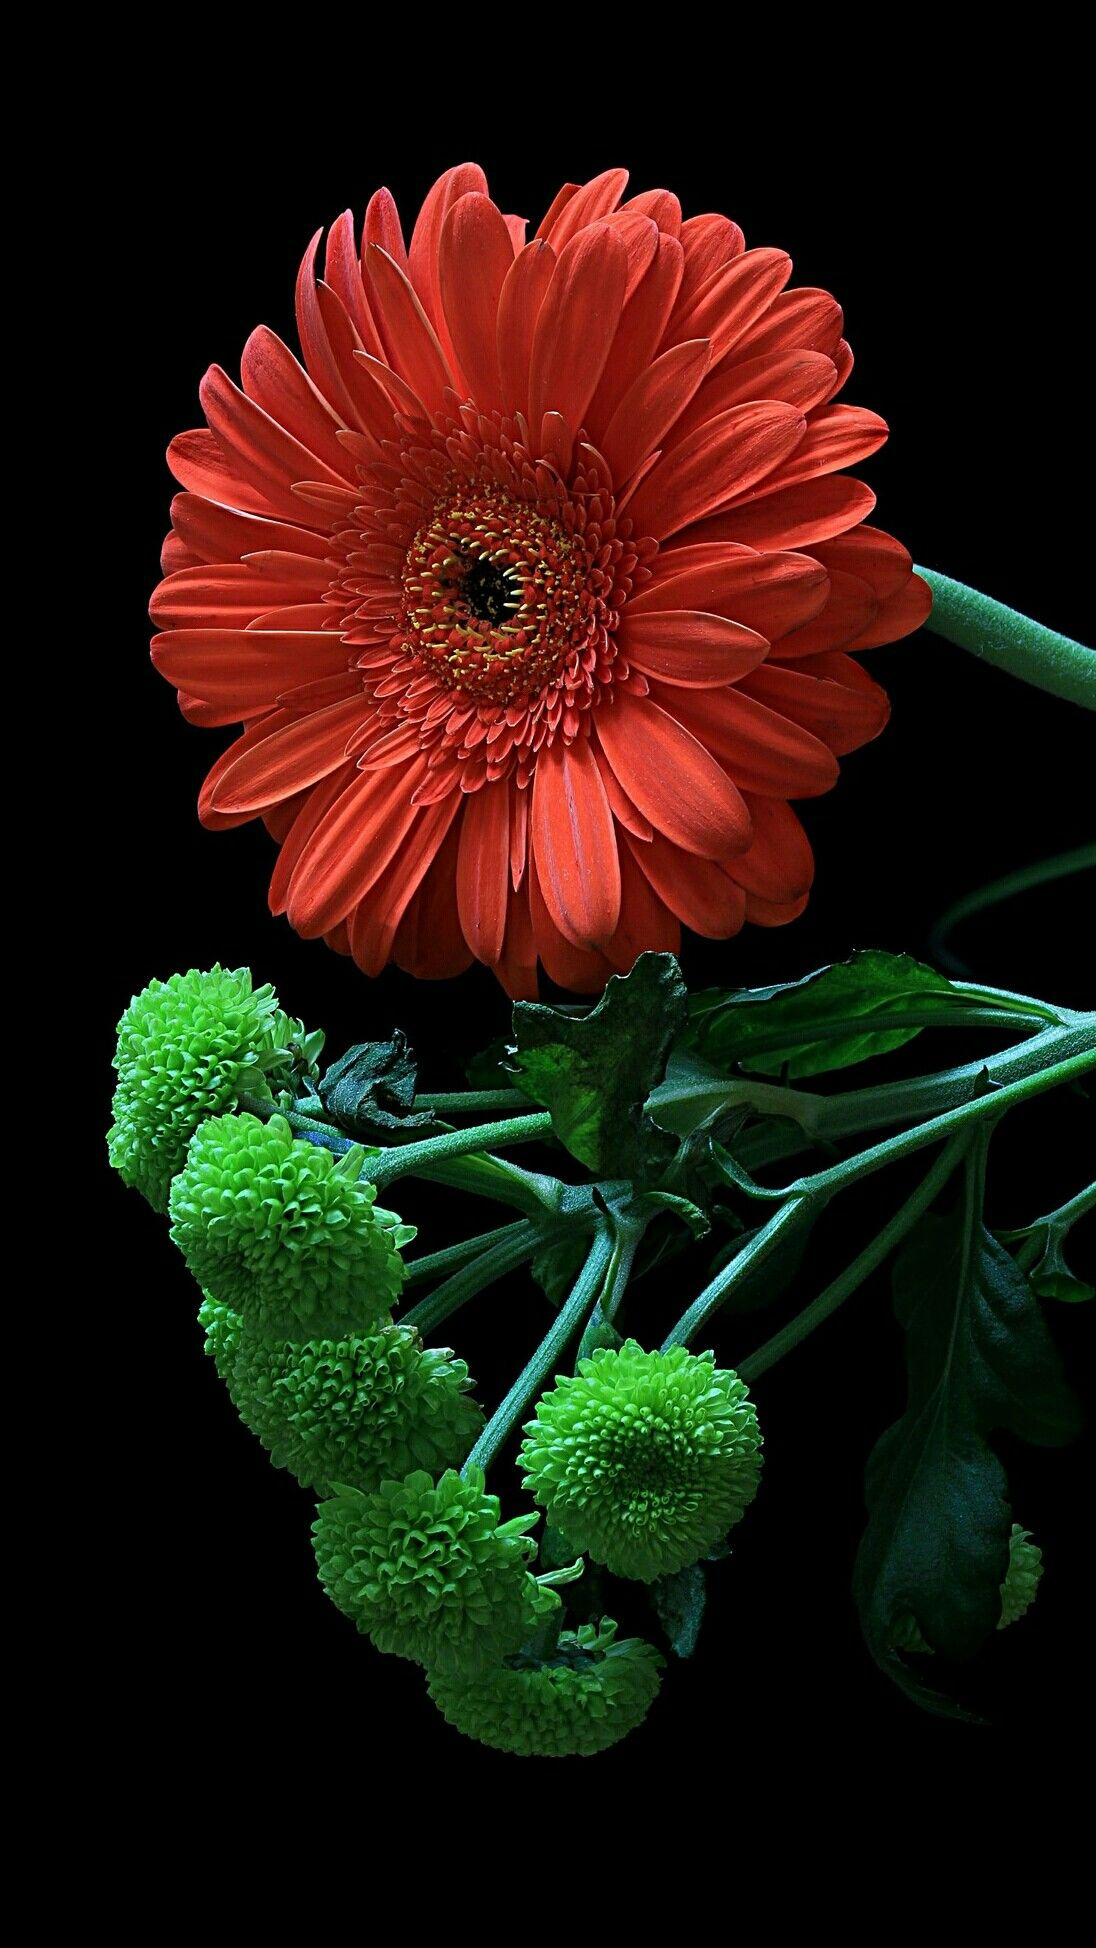 Pin By Galal Ahmad On Cvety Gerbera Flower Beautiful Flowers Special Flowers